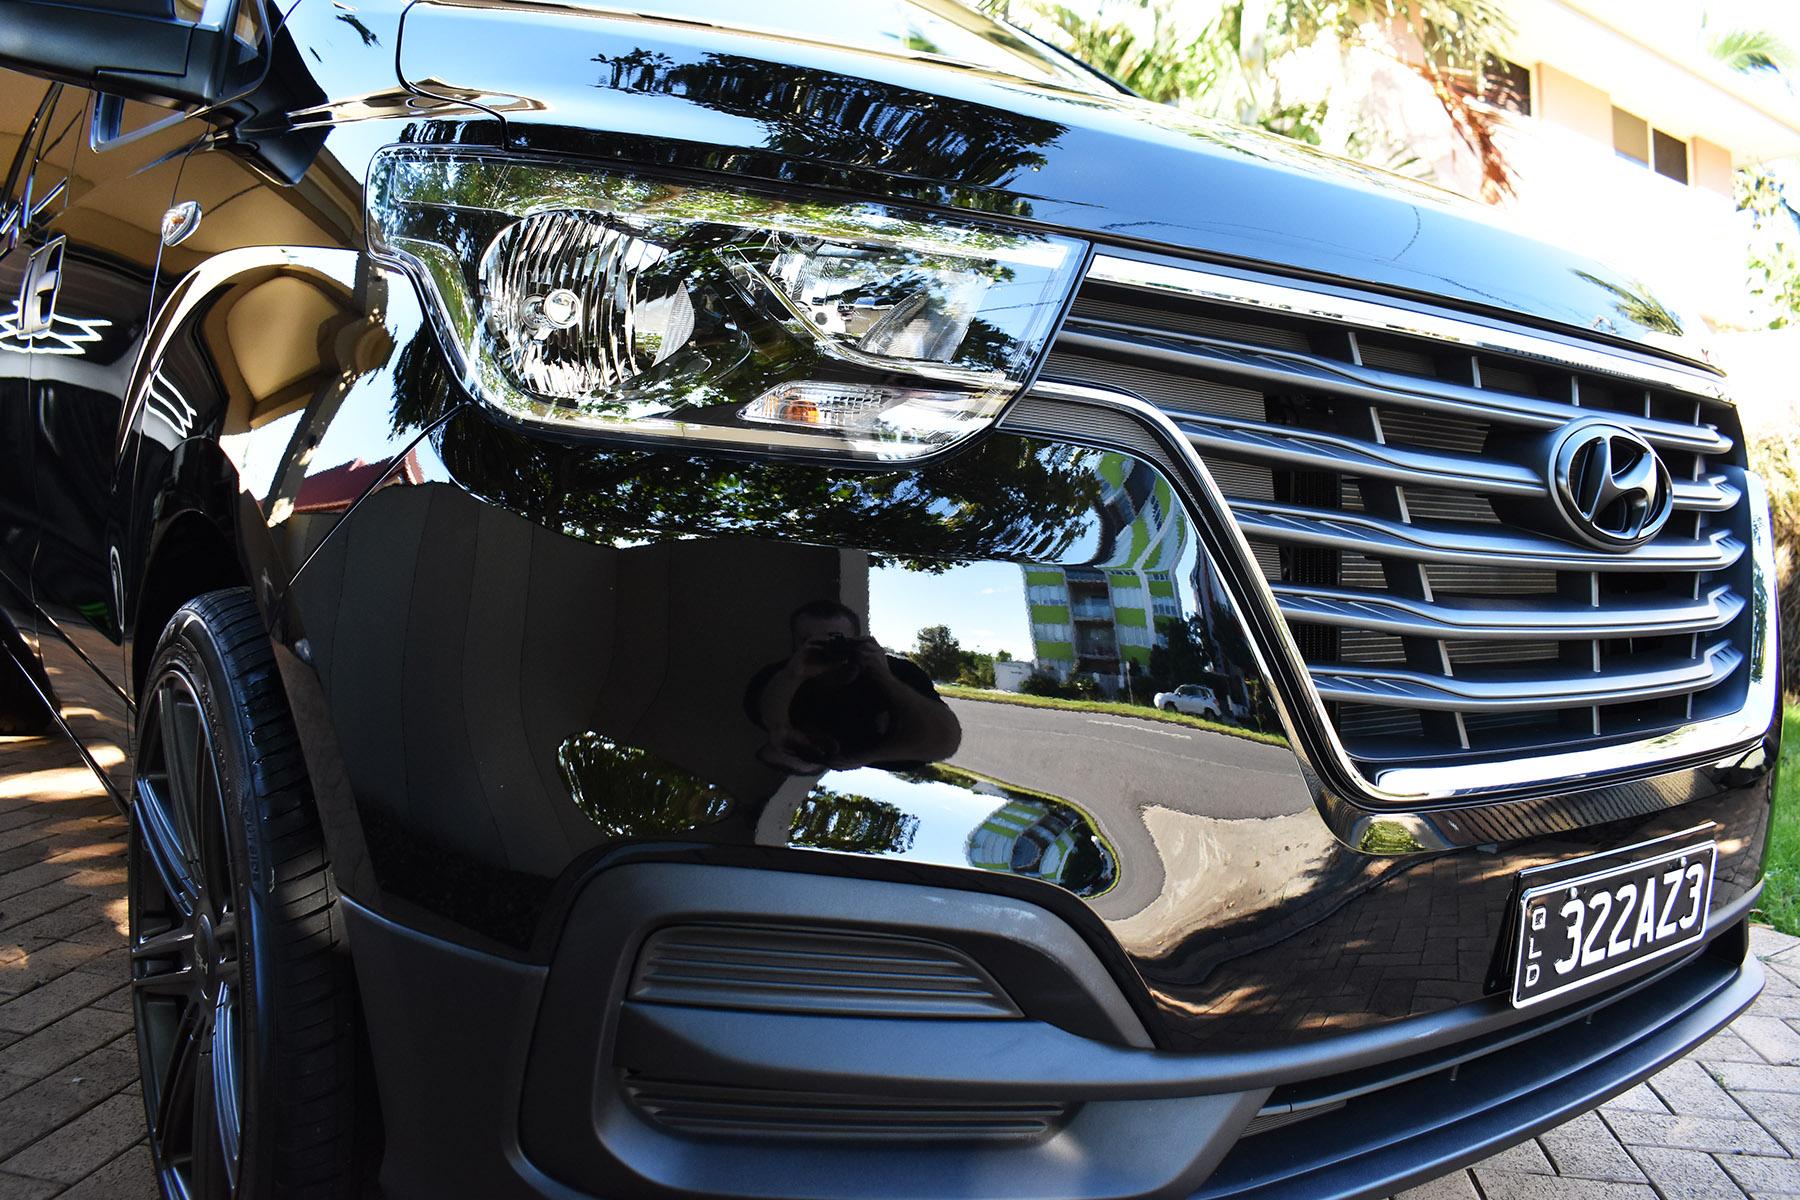 Hyundai iLoad New Vehicle Paint Protection Brisbane Near me 2